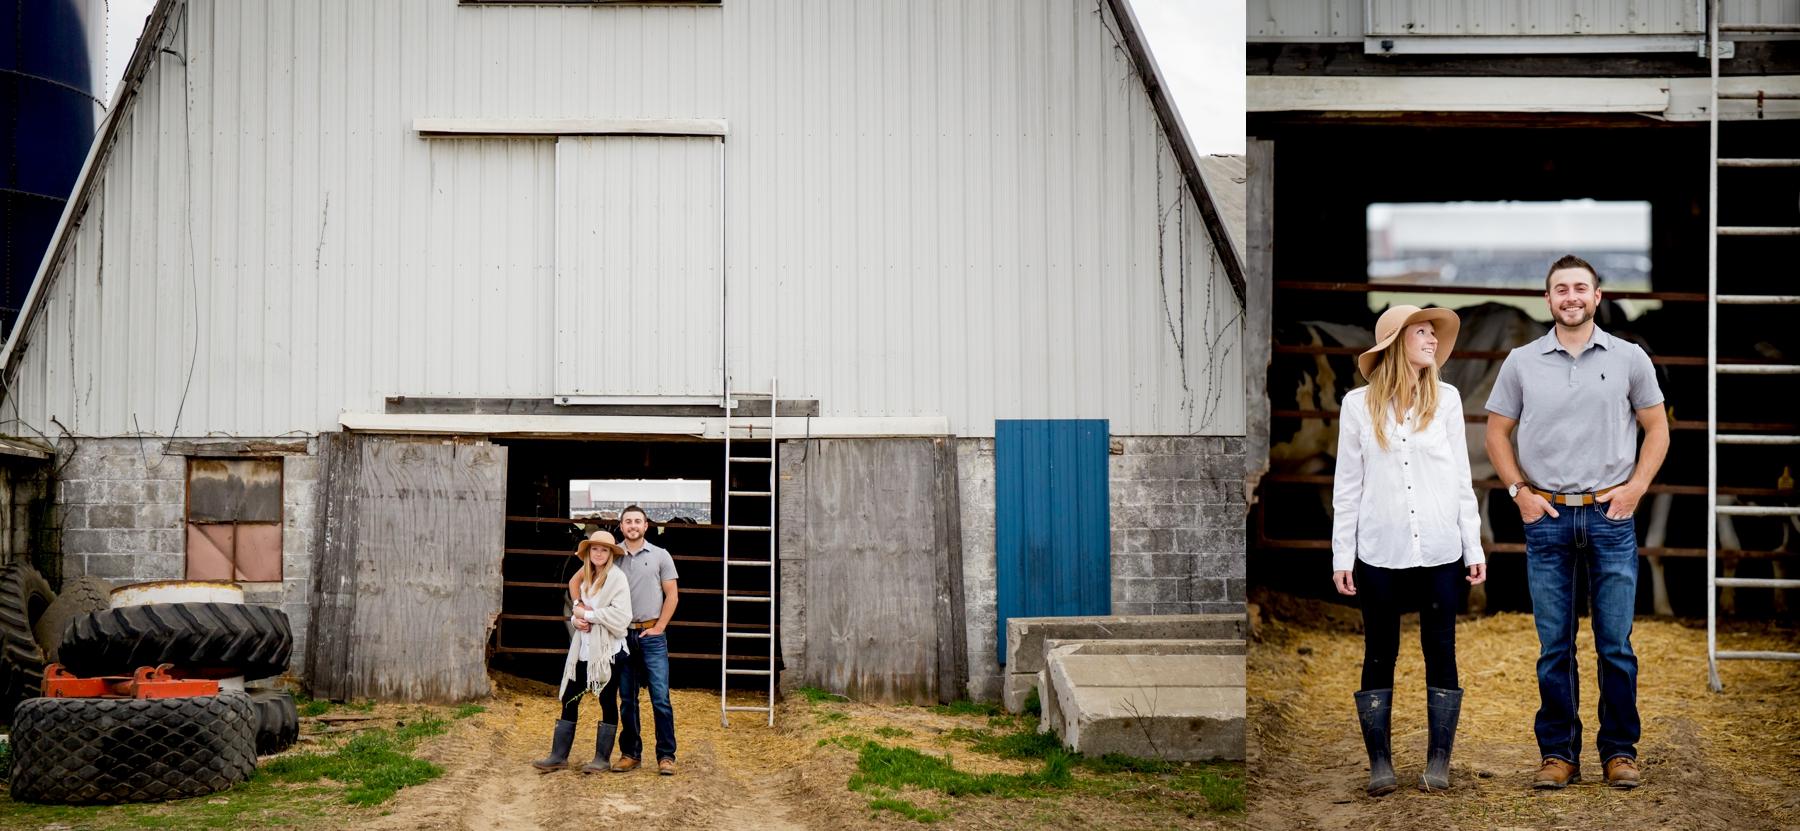 Brandon_Shafer_Photography_Shane_Ashley_Greenhouse_Farm_Michigan_Engagement_0022.jpg